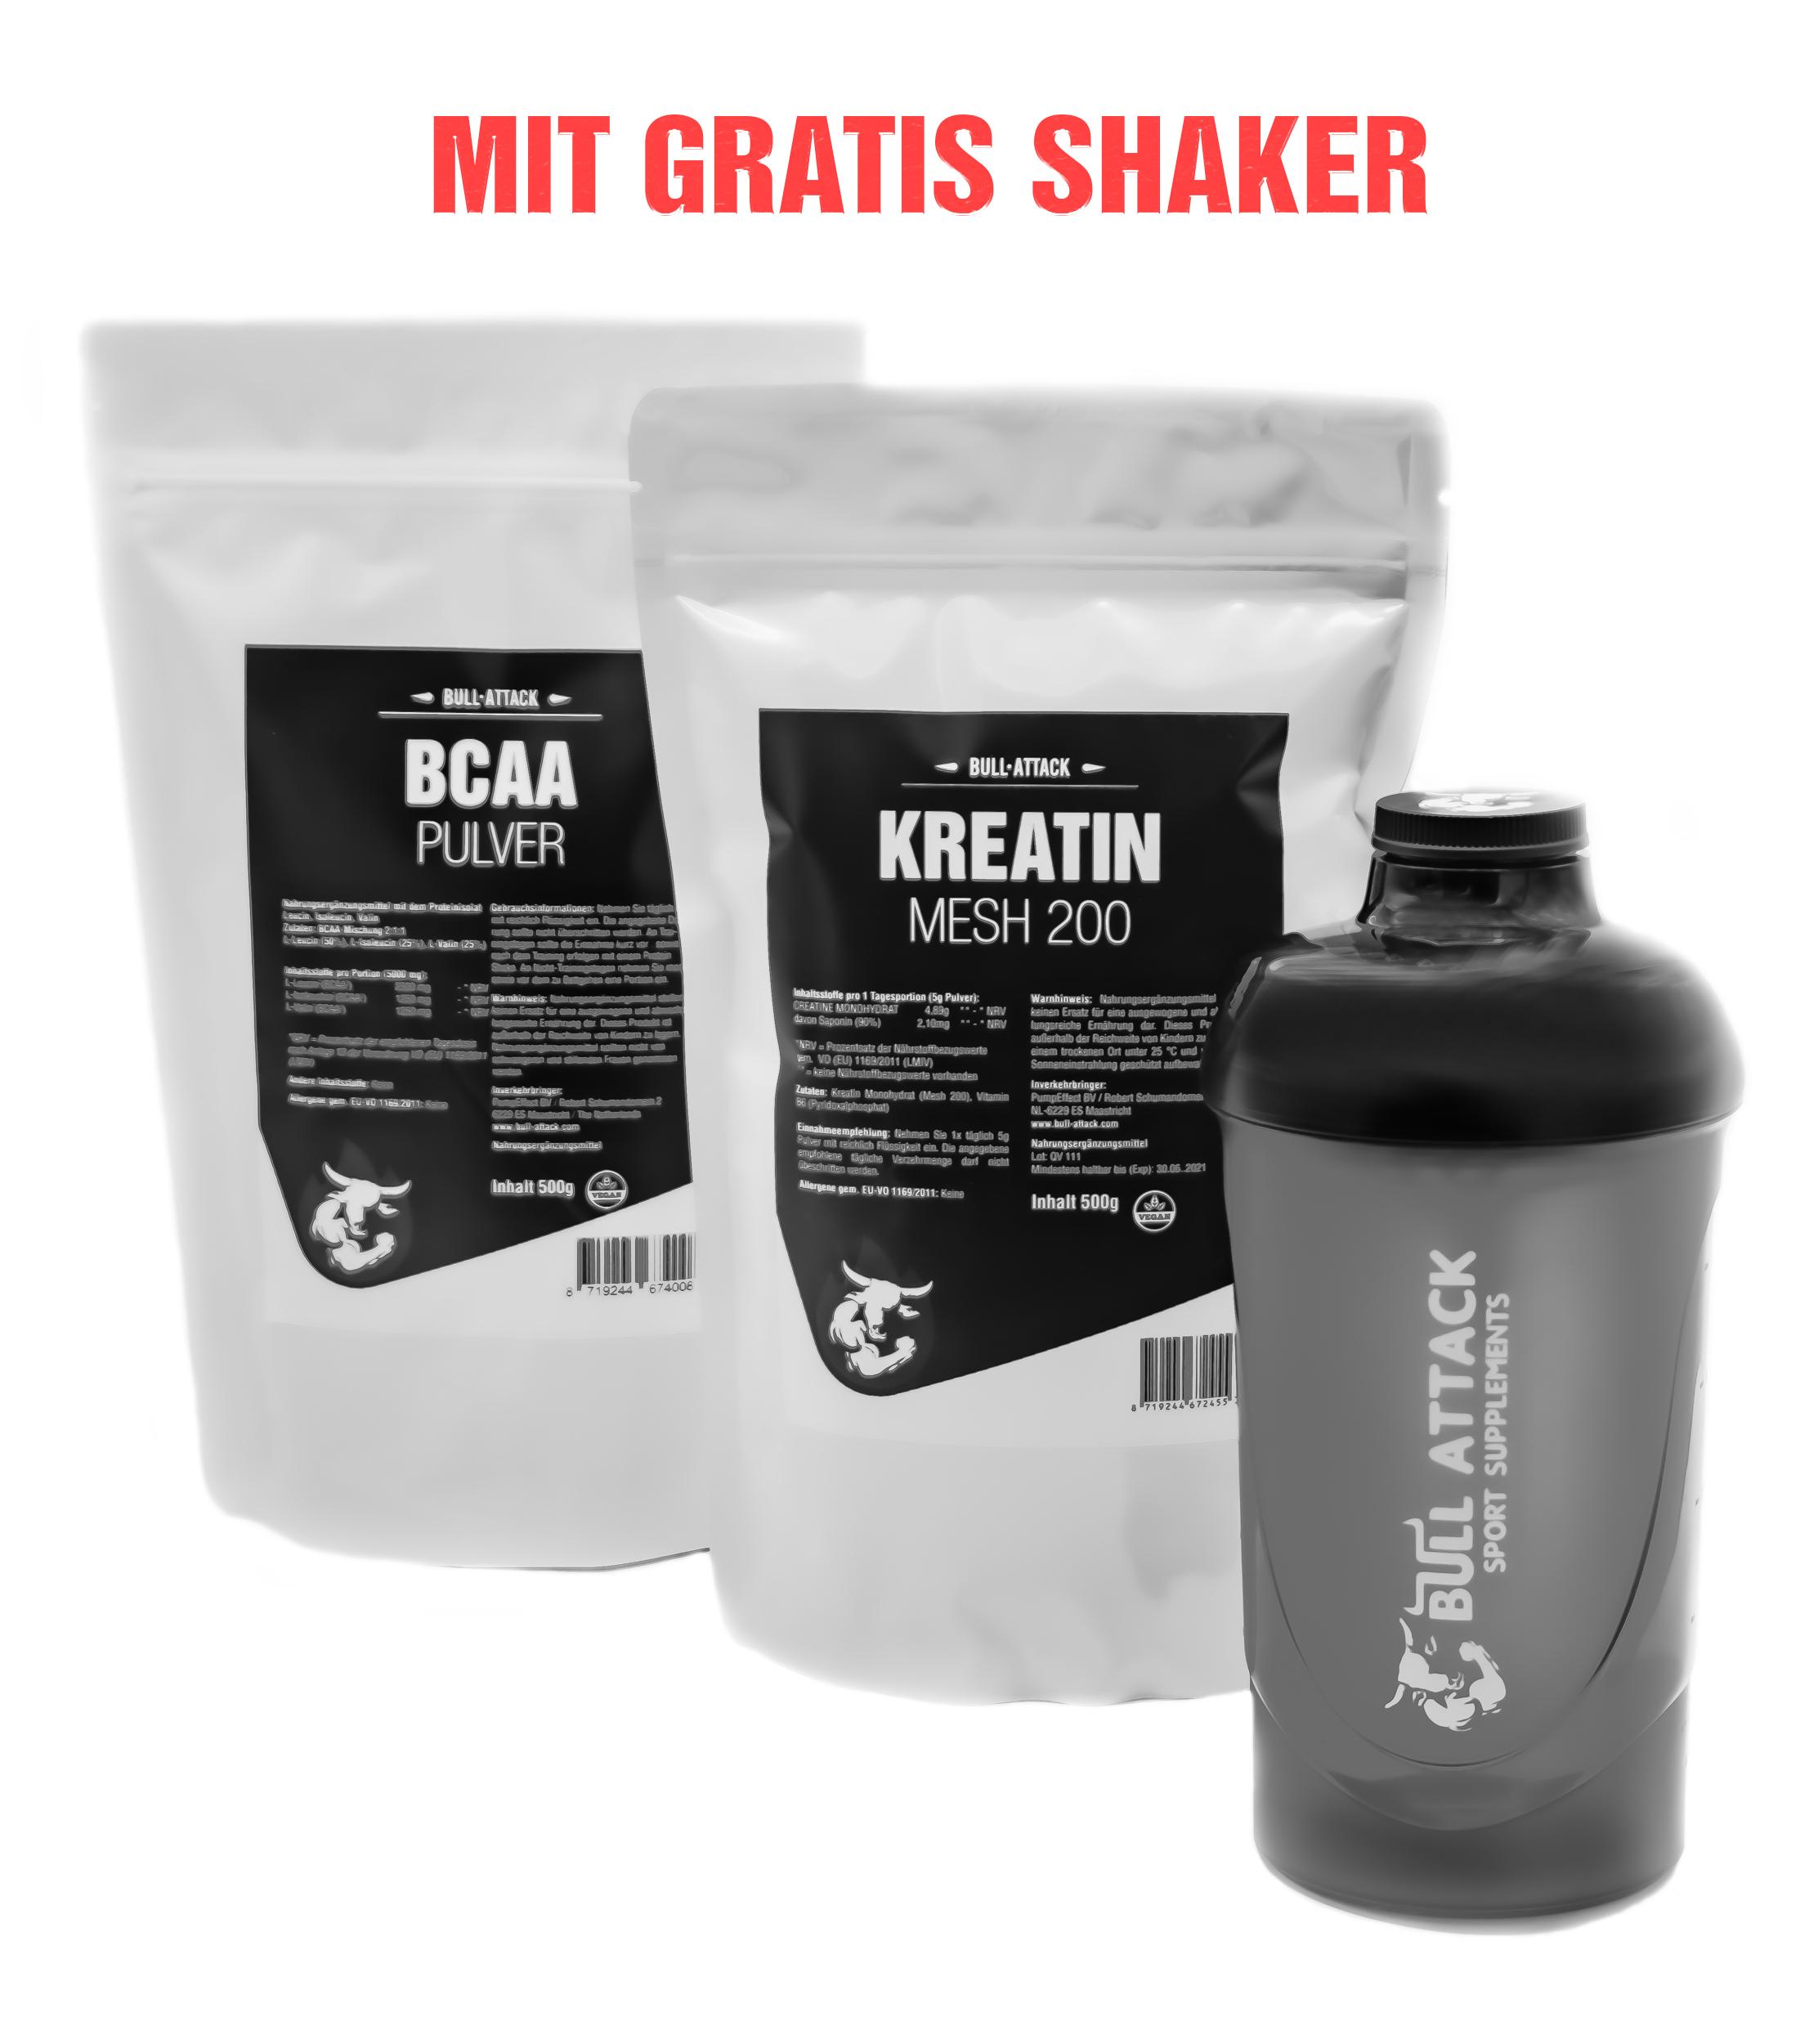 Kreatin Mesh Pulver 500g | BCAA Pulver 500g | Gratis BullAttack Shaker